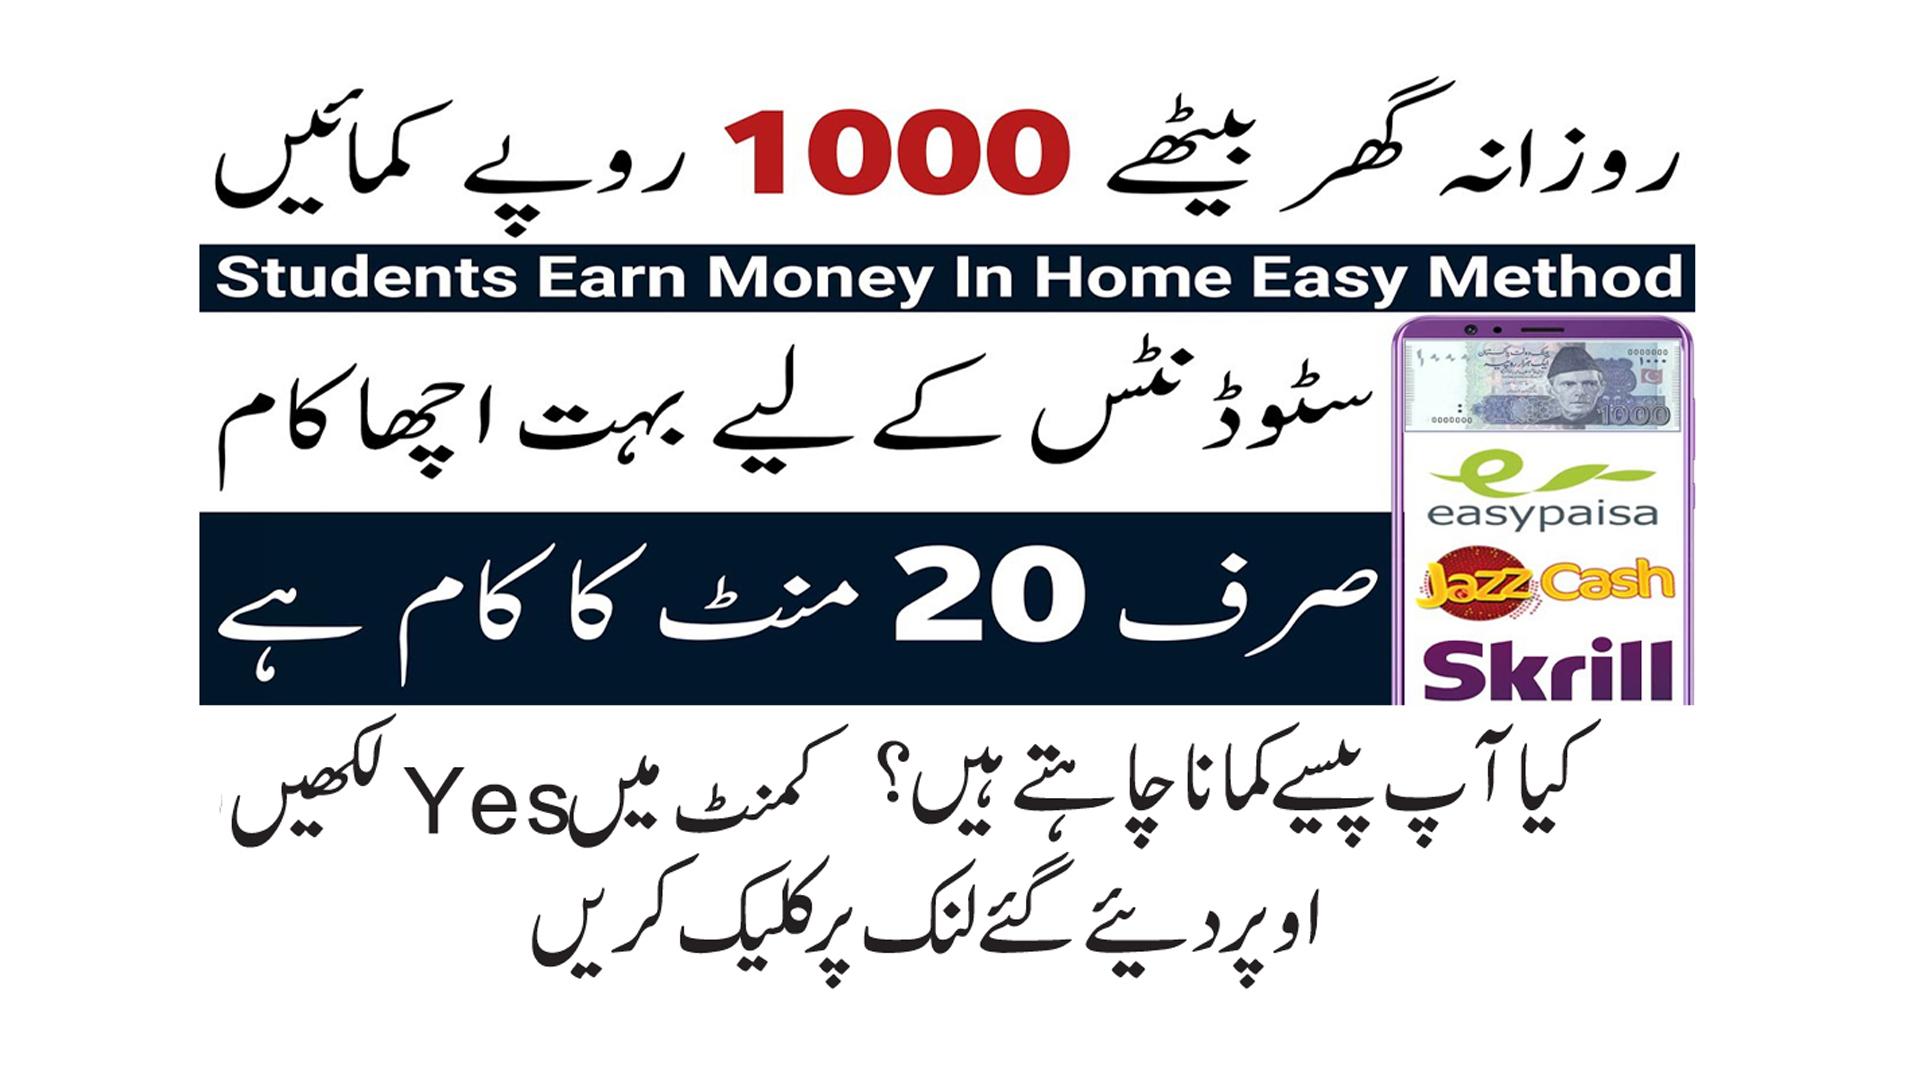 Top 15 Easy Ways to Make Money Online